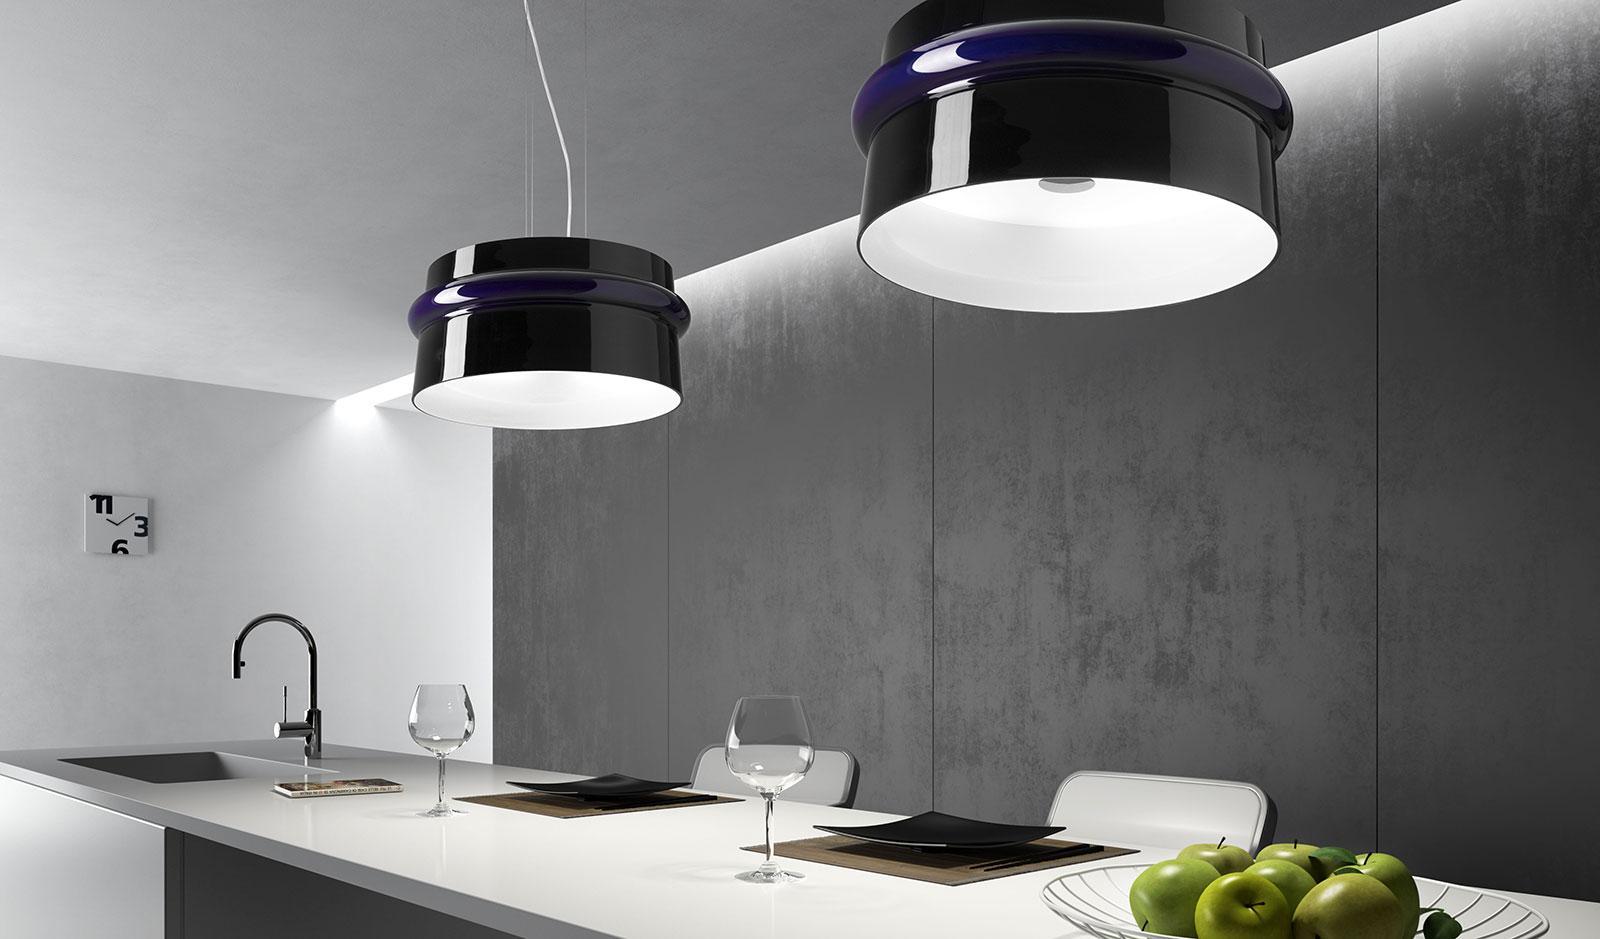 suspension verre soufflé murano lustre luminaire abat jour original plafonnier made in italy en ligne qualité luxe illumination luminaires italien noire